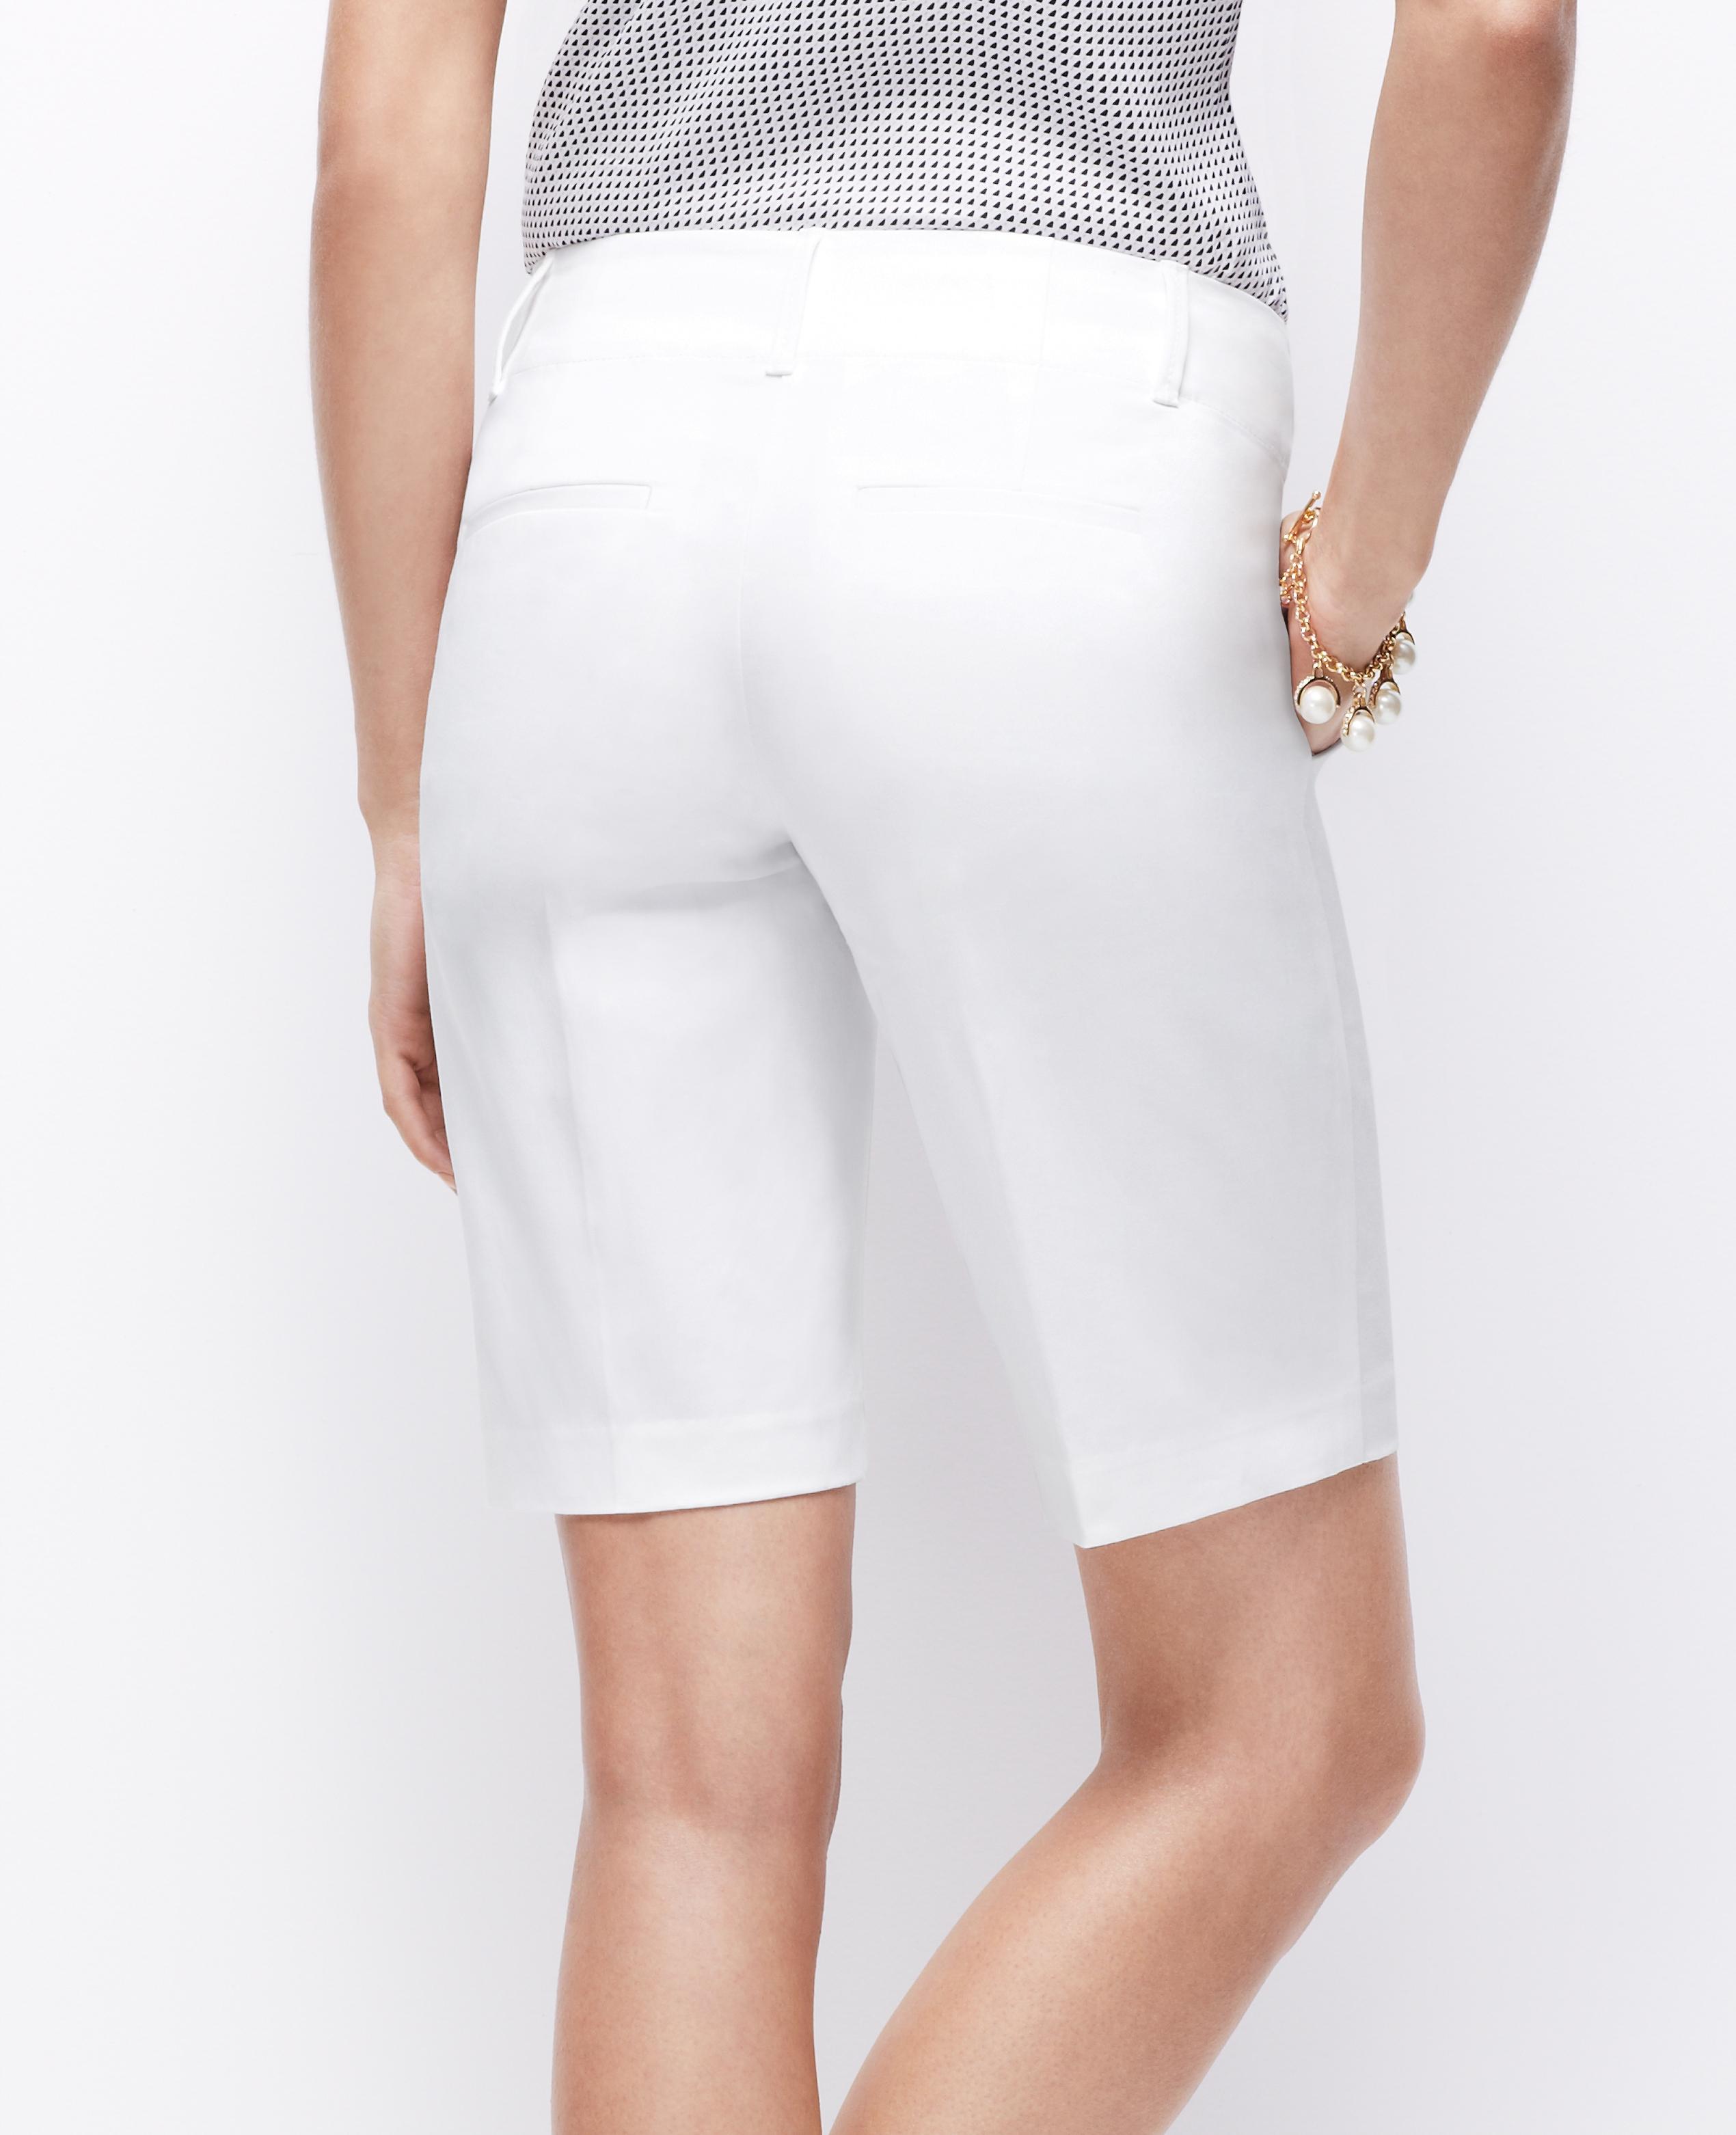 Ann taylor Petite Cotton Walking Shorts in White | Lyst